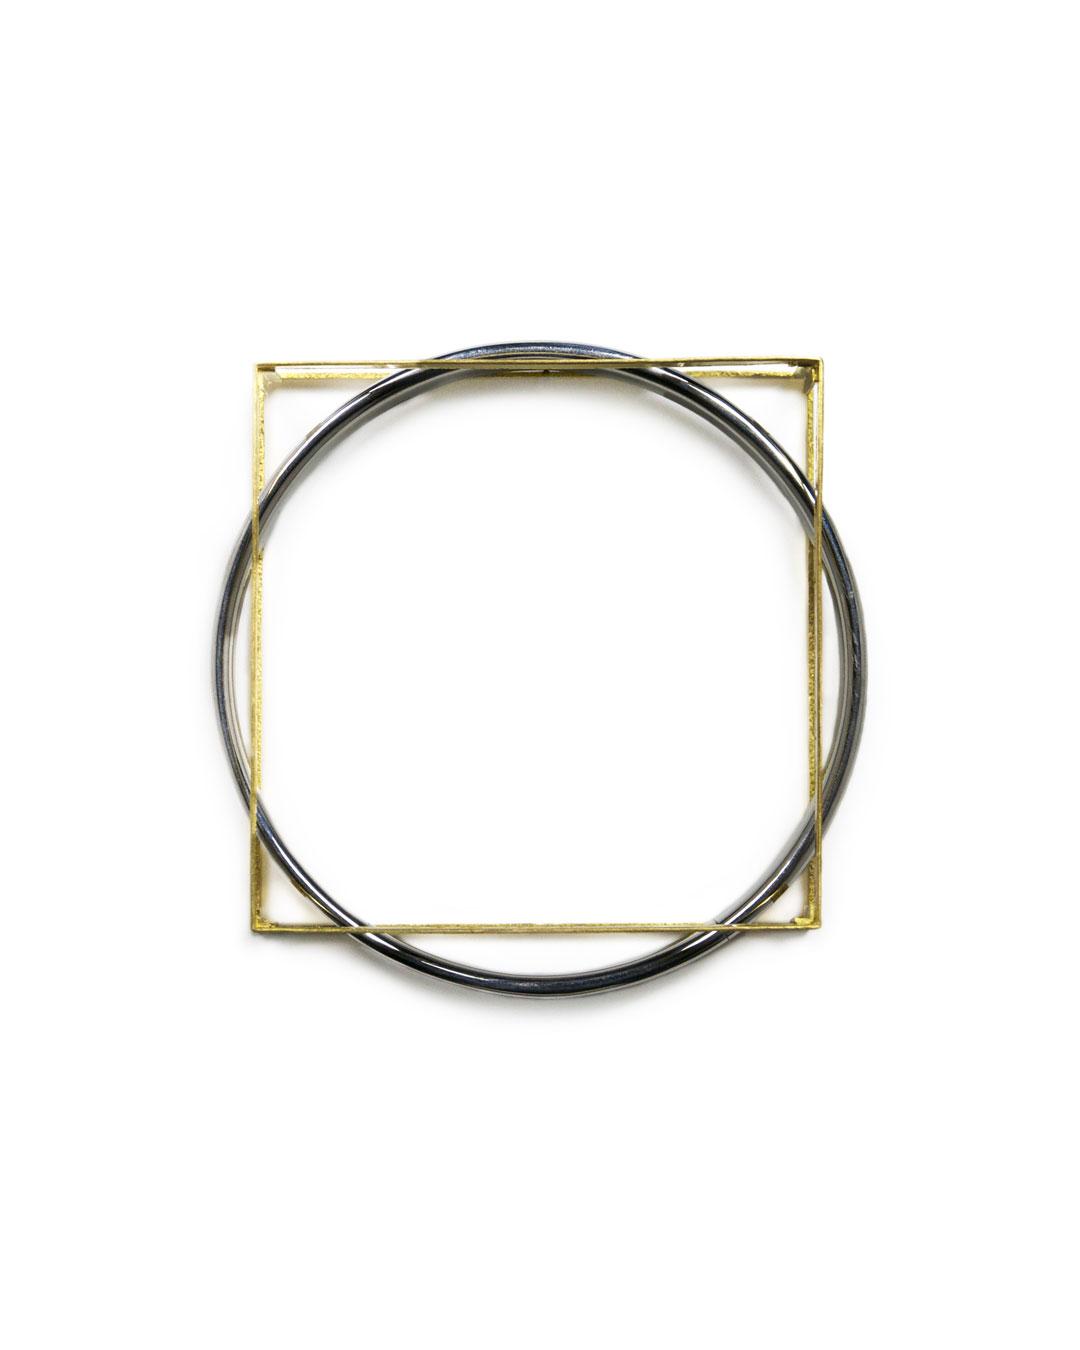 Okinari Kurokawa, untitled, 2012, bracelet; 20ct gold, stainless steel, 83 x 83 x 20 mm